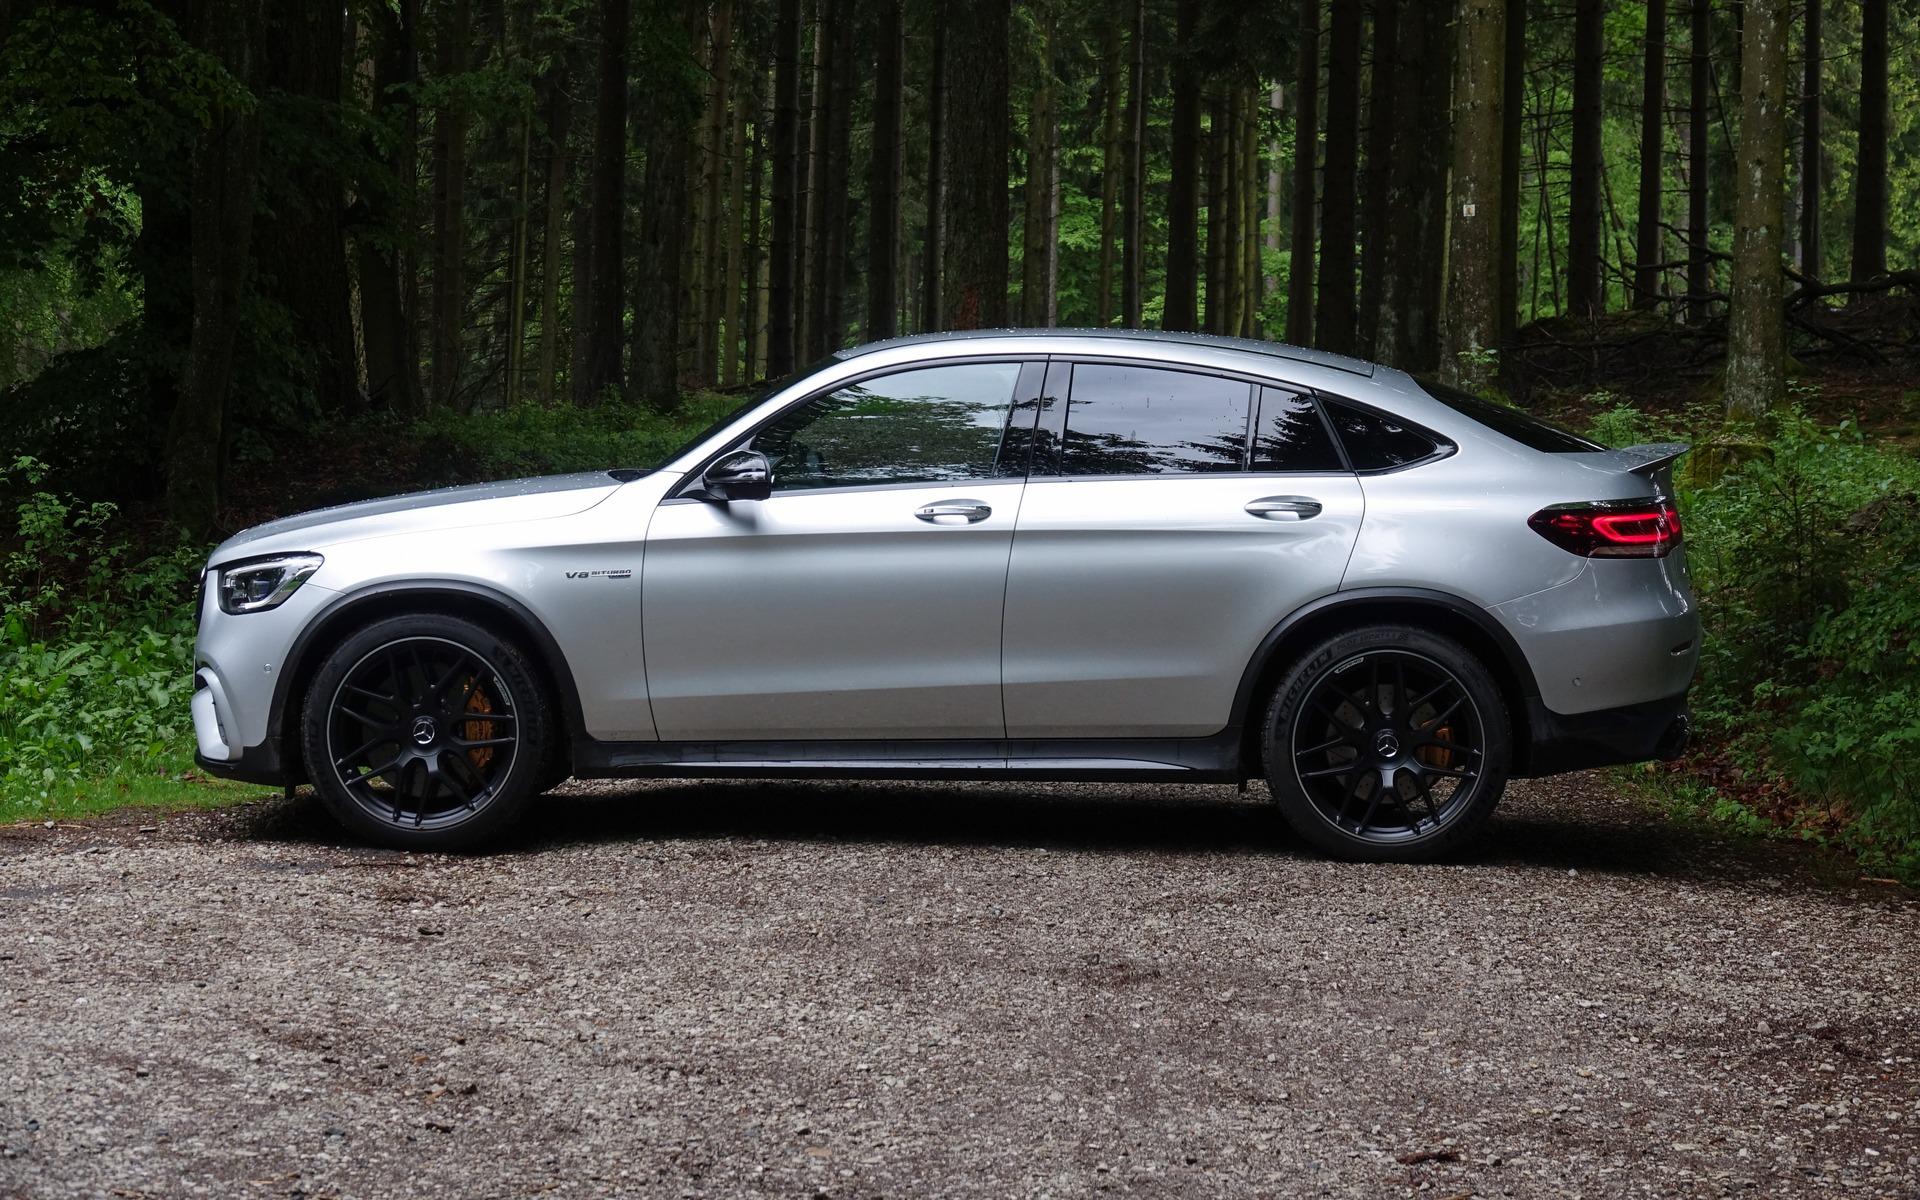 <p>2020 Mercedes-AMG GLC 63 S Coupe</p>